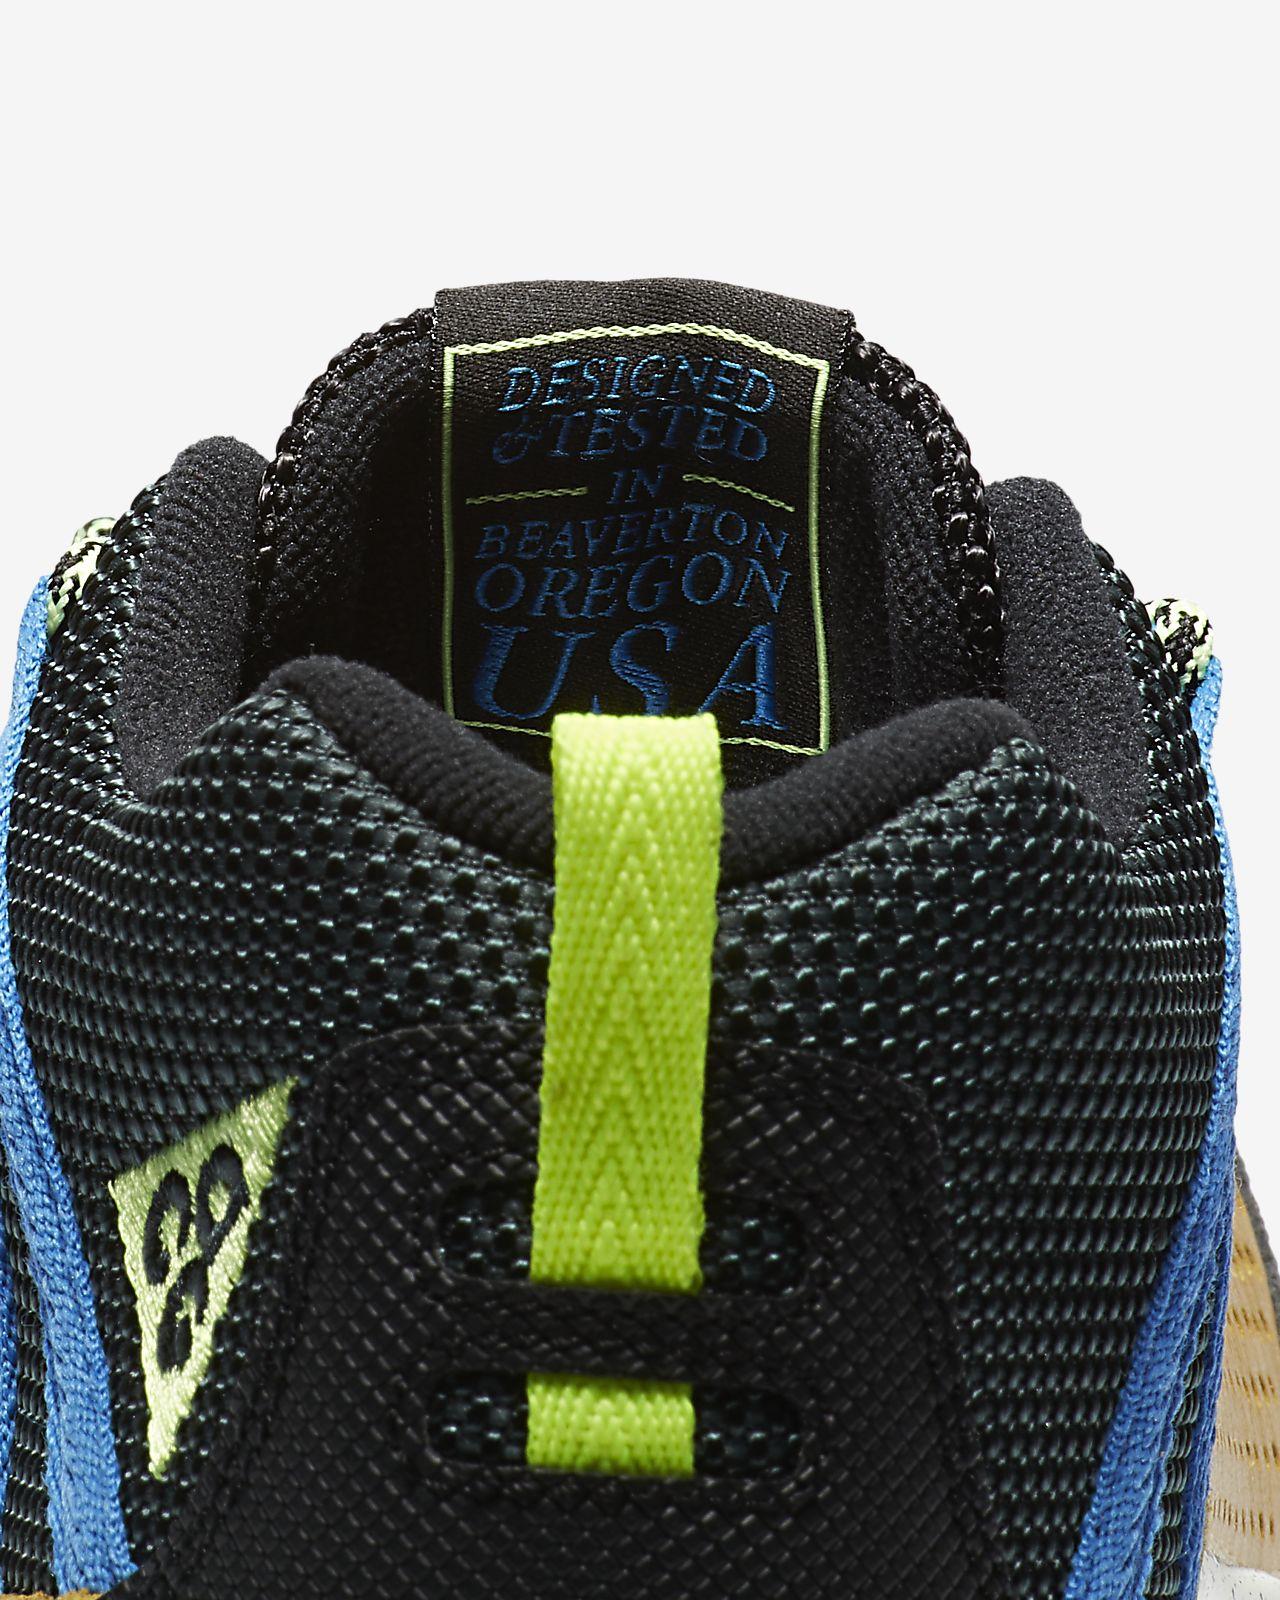 Sportschuhe Nike Online Shop Sportschuhe Nike Acg Okwahn 2